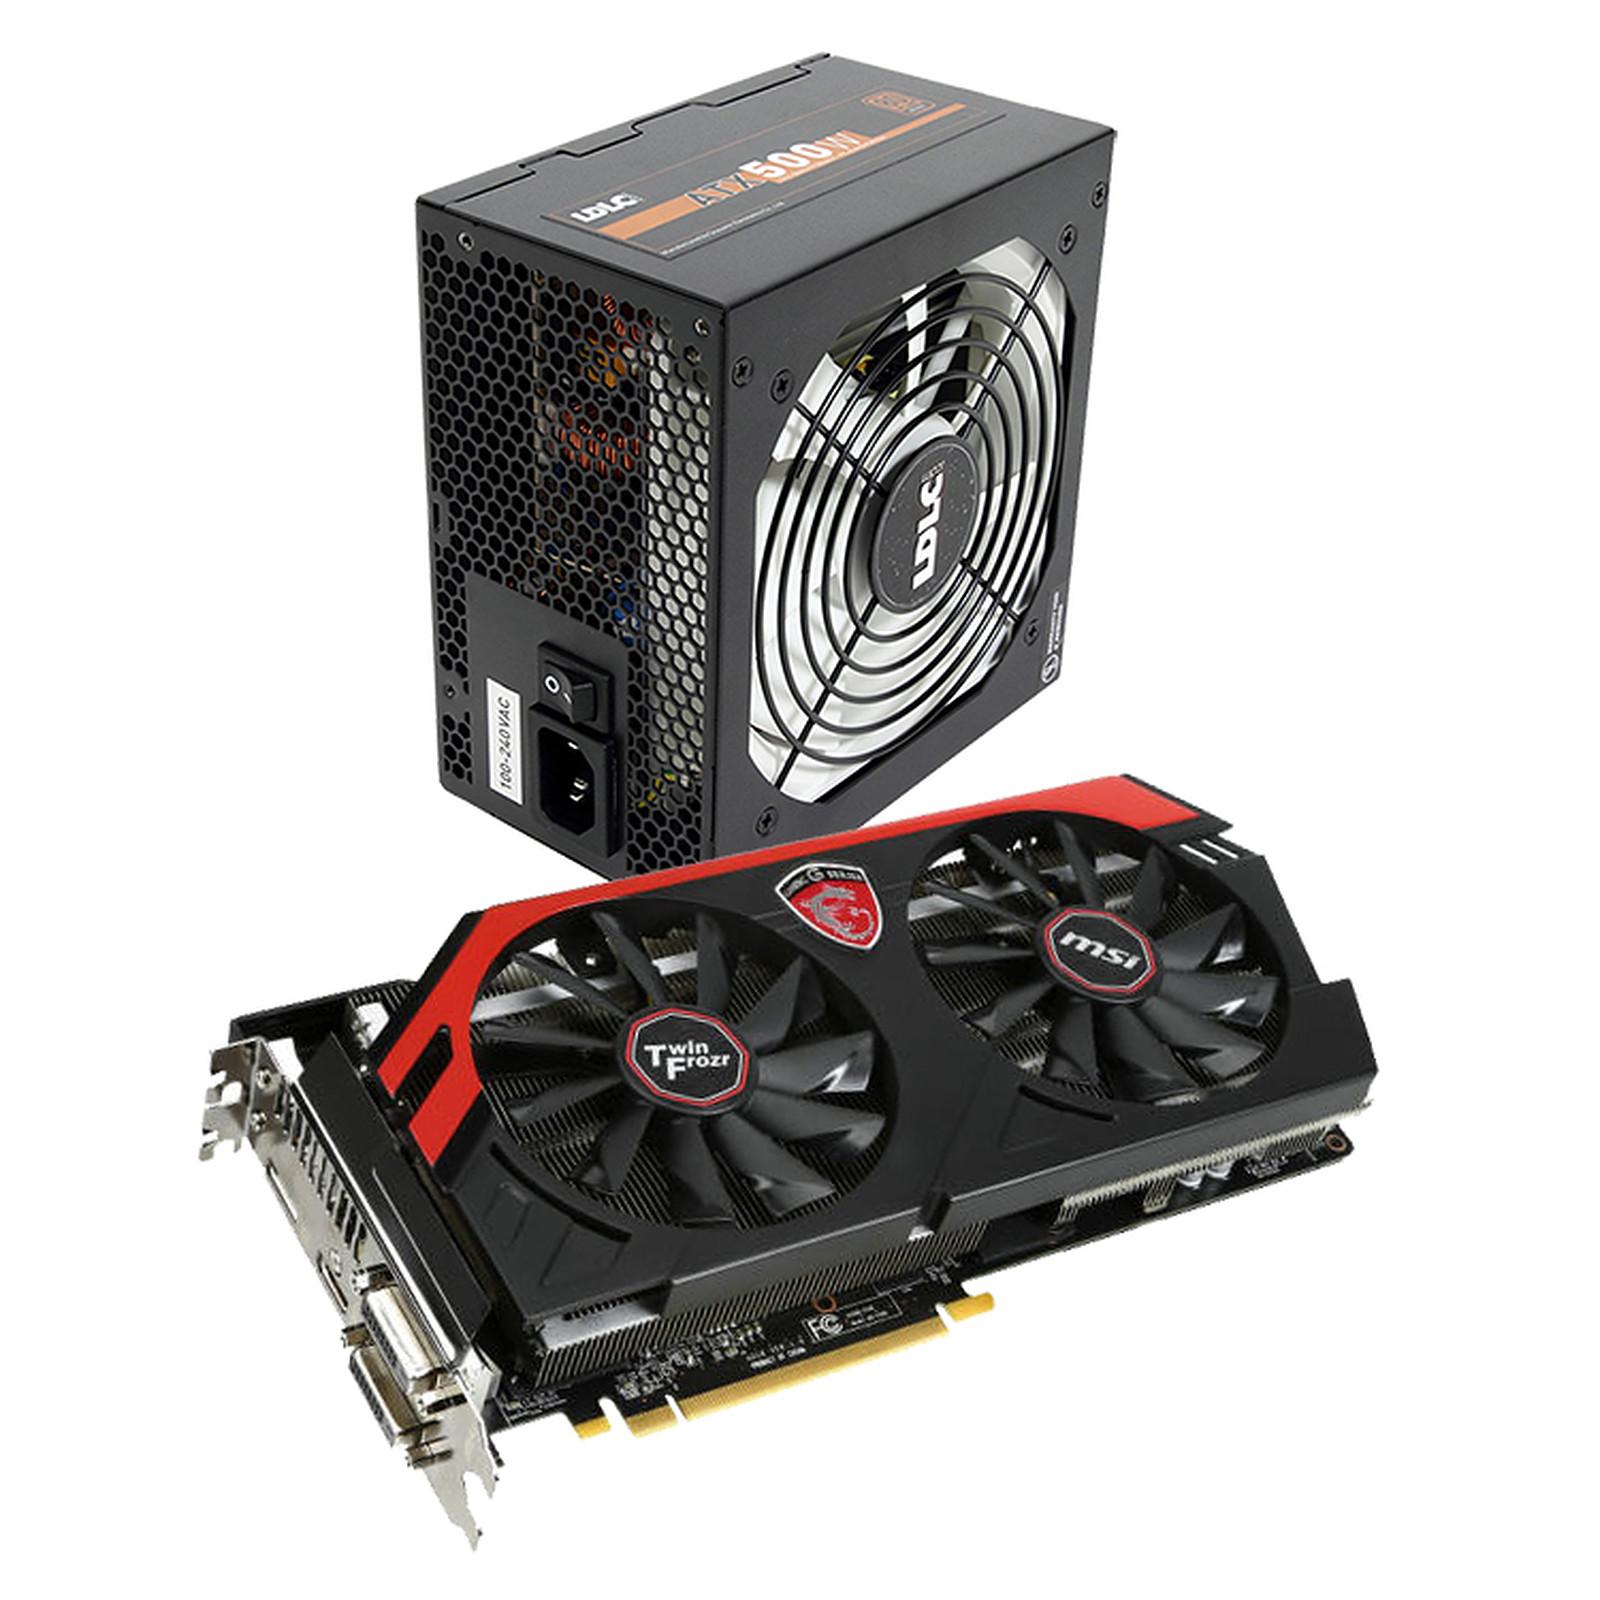 MSI Radeon R9 290 GAMING 4G + LDLC BG-500 Quality Select 80PLUS Bronze